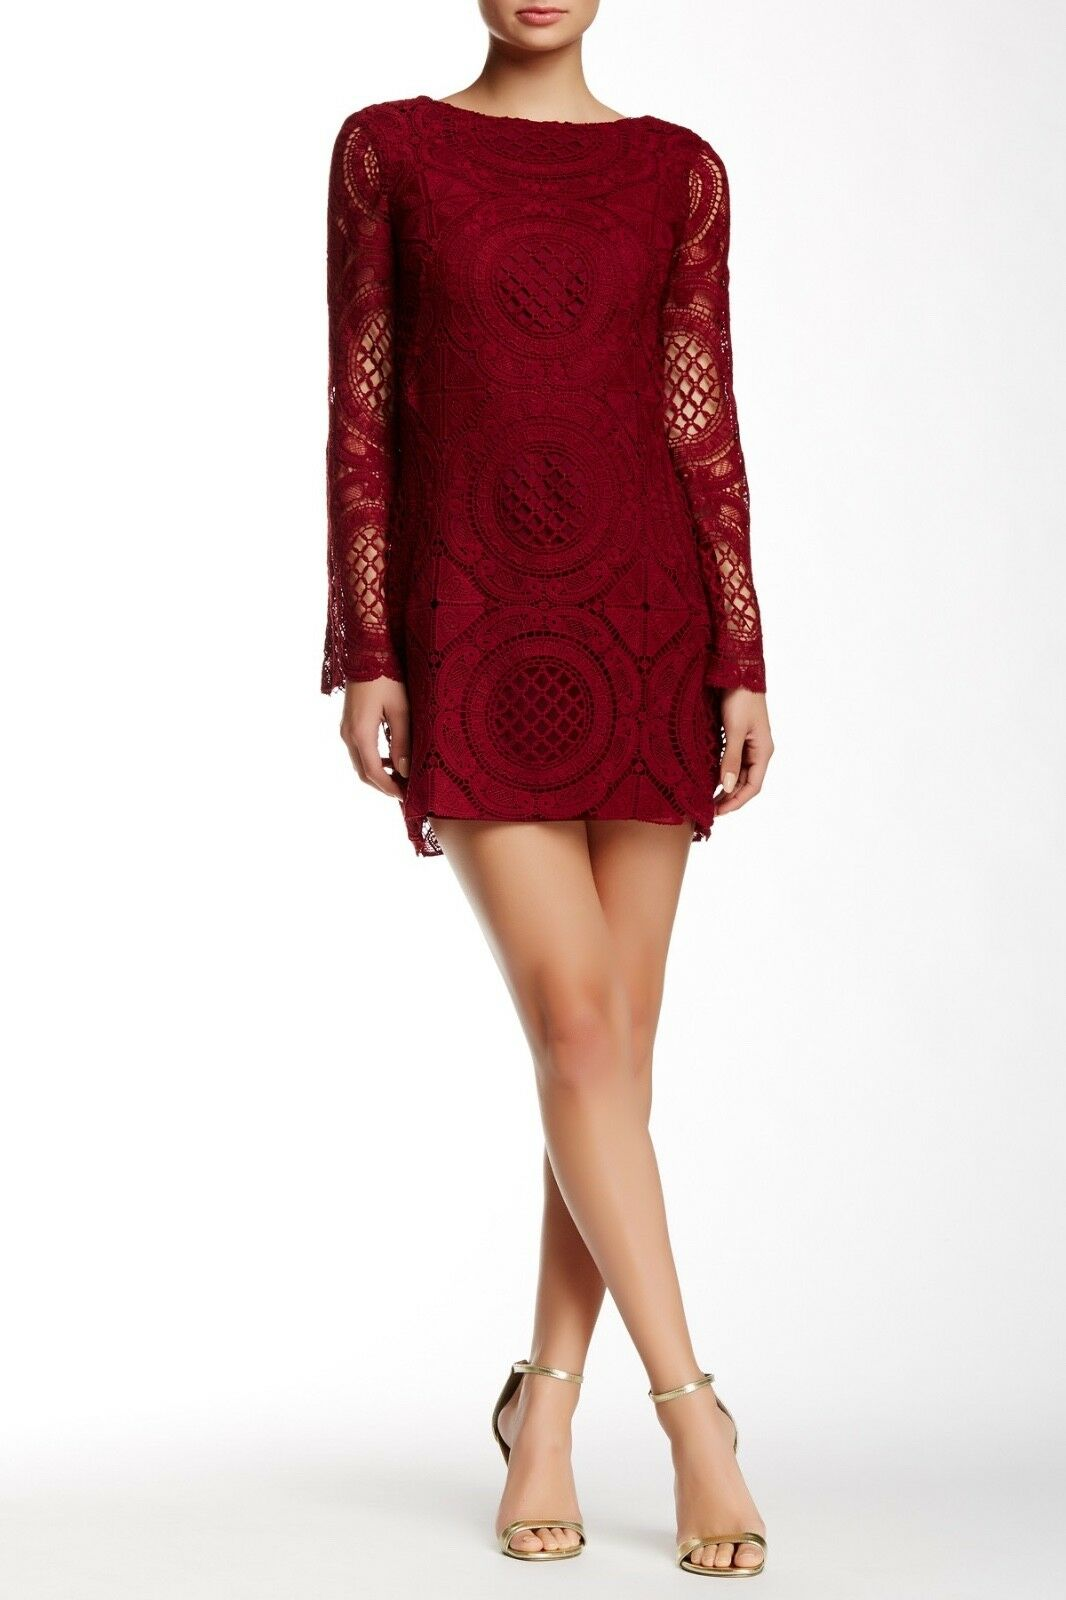 Alexia Admor Crochet Long Sleeve Dress NWT     SZ M   C325